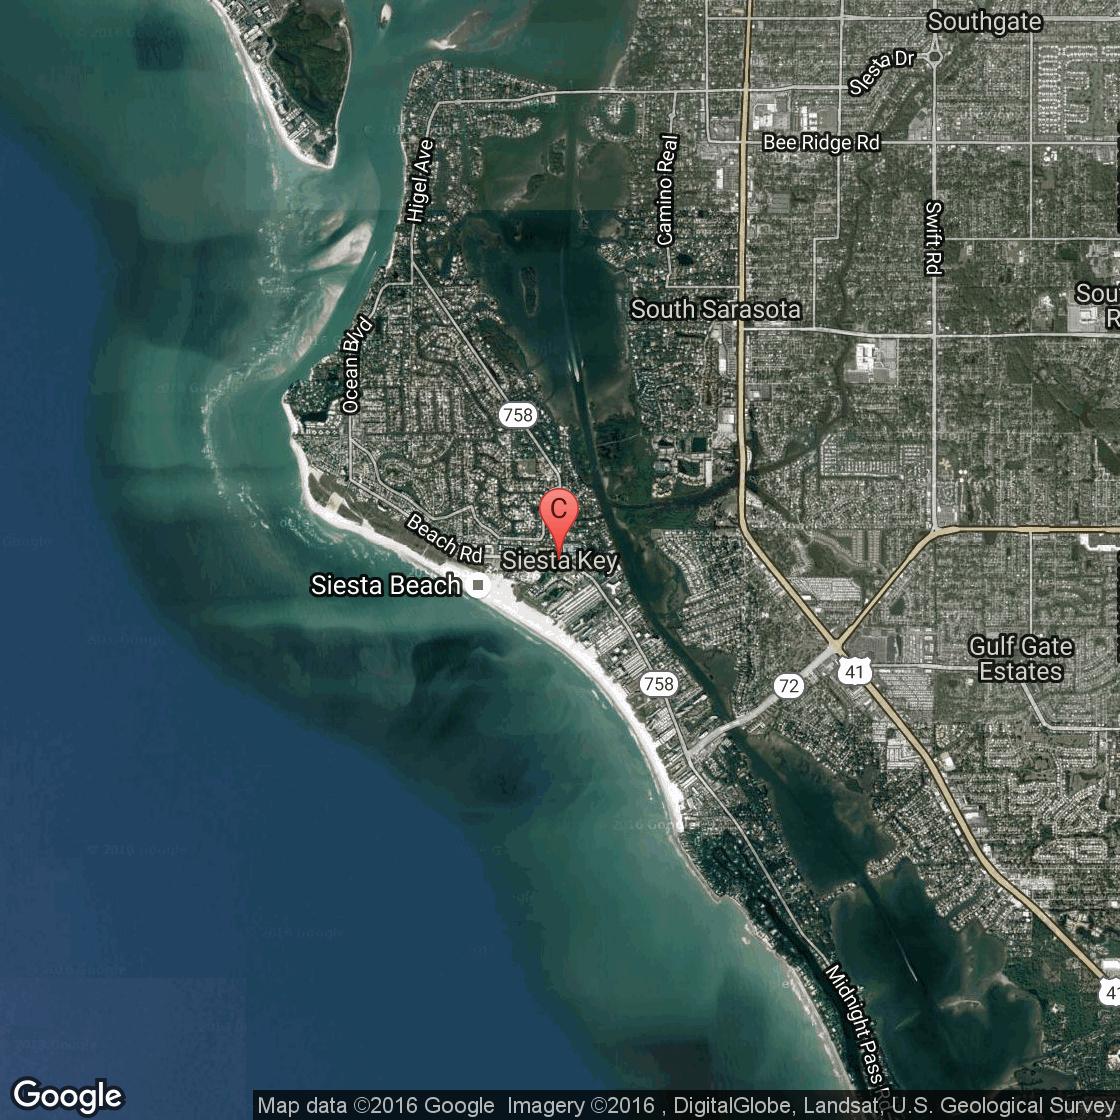 What To Do On The Island Of Siesta Key, Florida | Usa Today - Siesta Beach Sarasota Florida Map